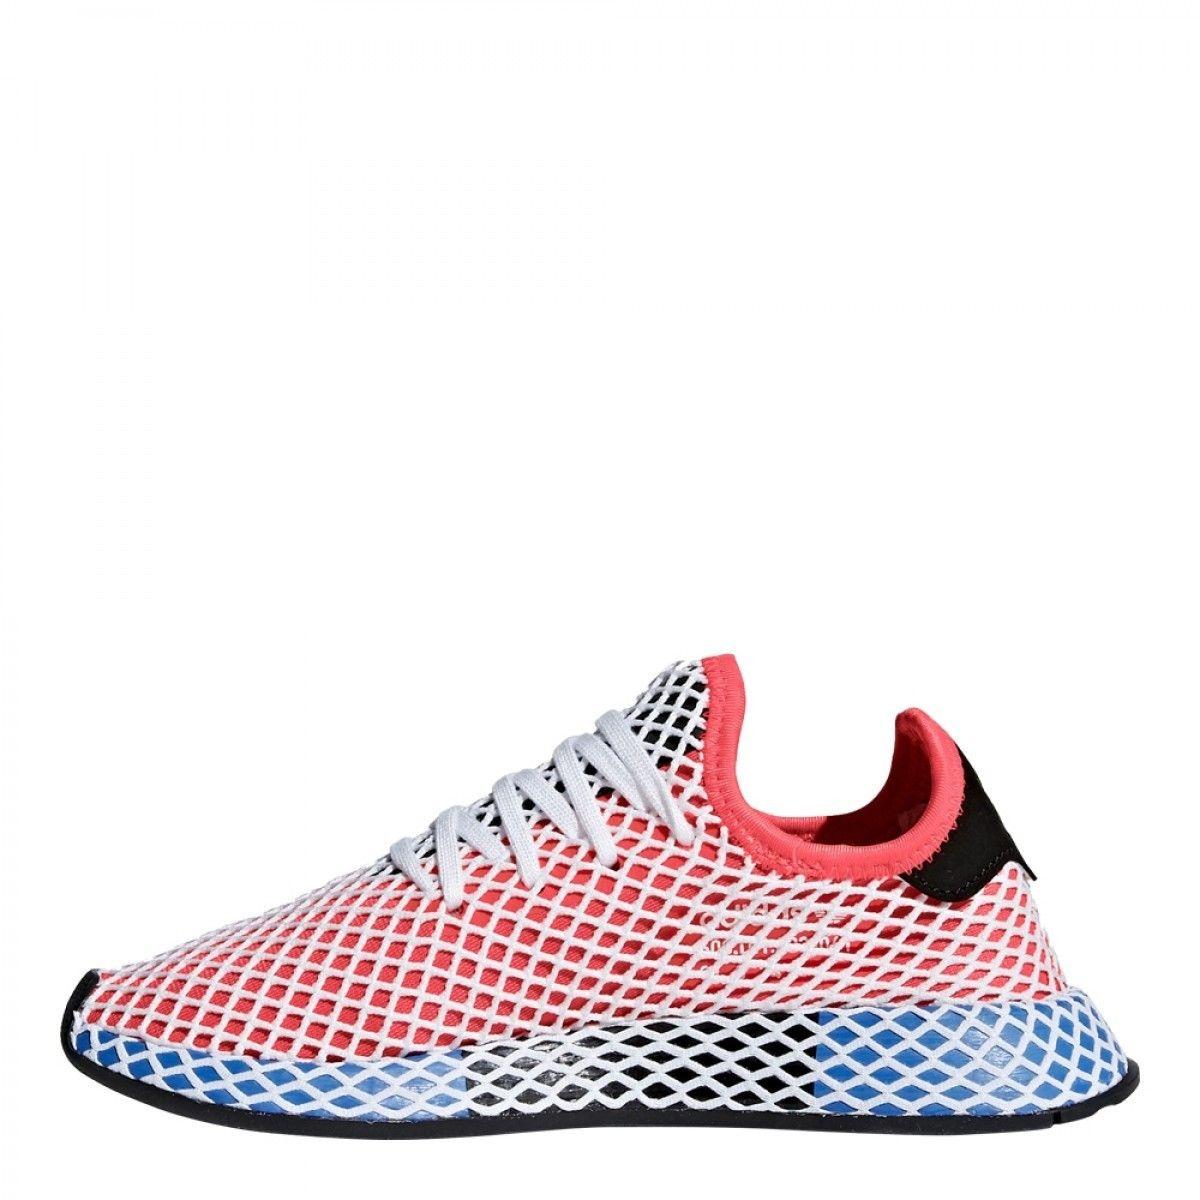 new style 507ef e5ed0 Adidas Originals Basket adidas Originals Deerupt Runner Junior - DA9610.  Loading zoom